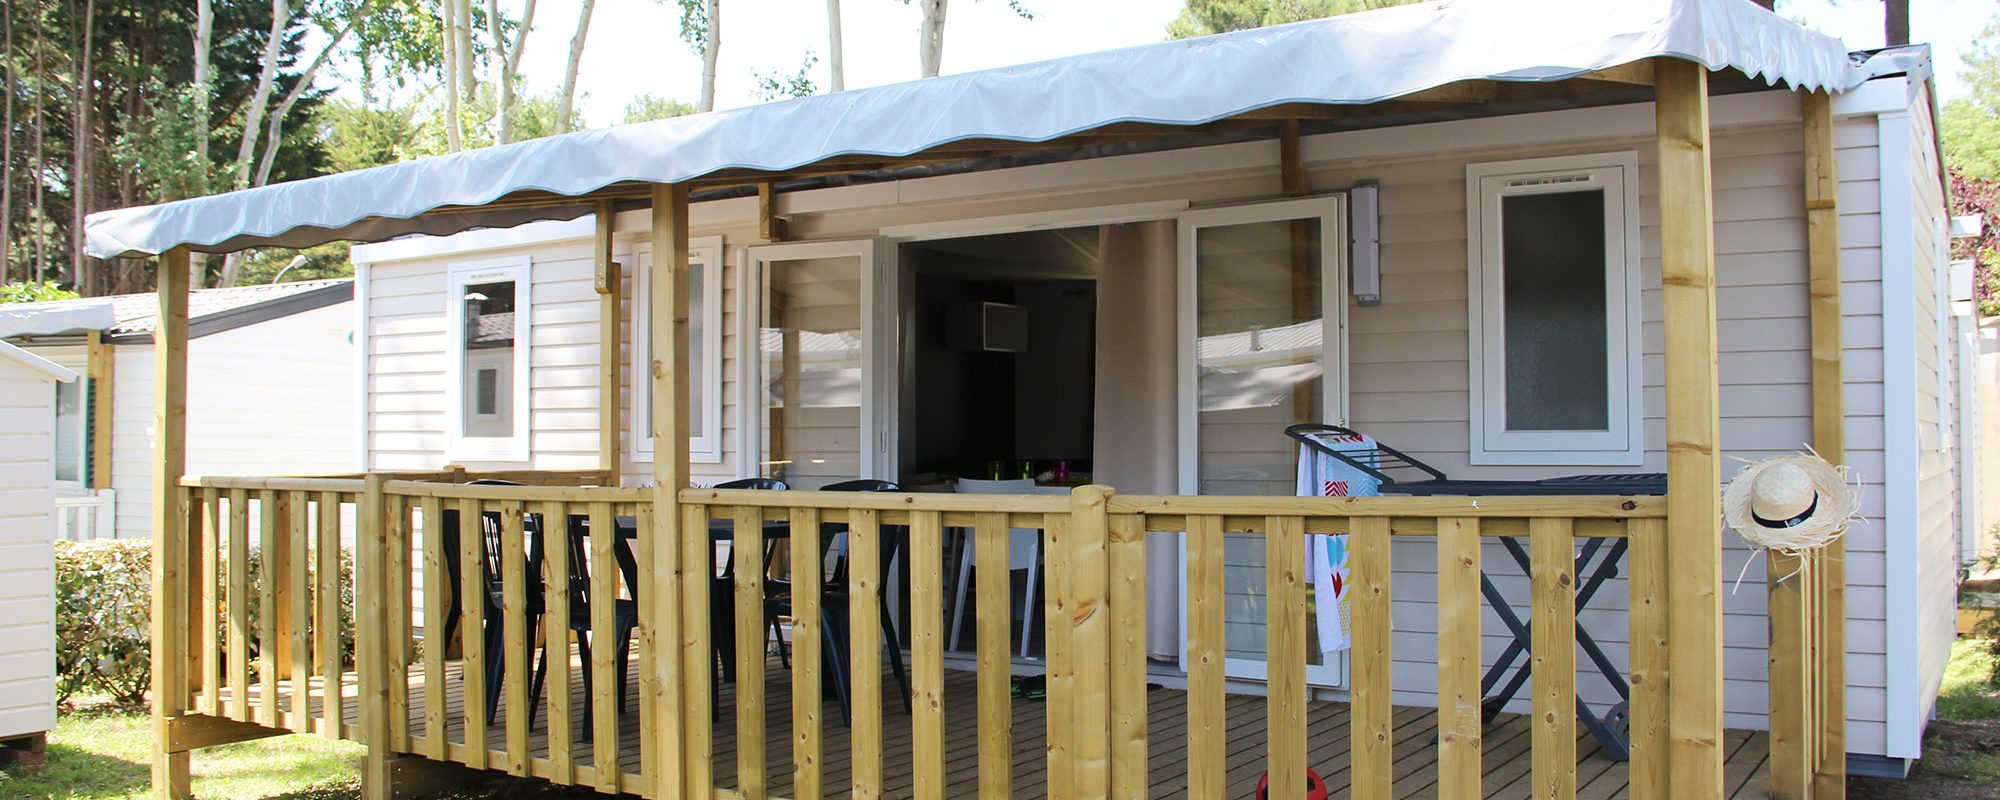 mobilhome cordelia en vente camping à proximité de Guérande